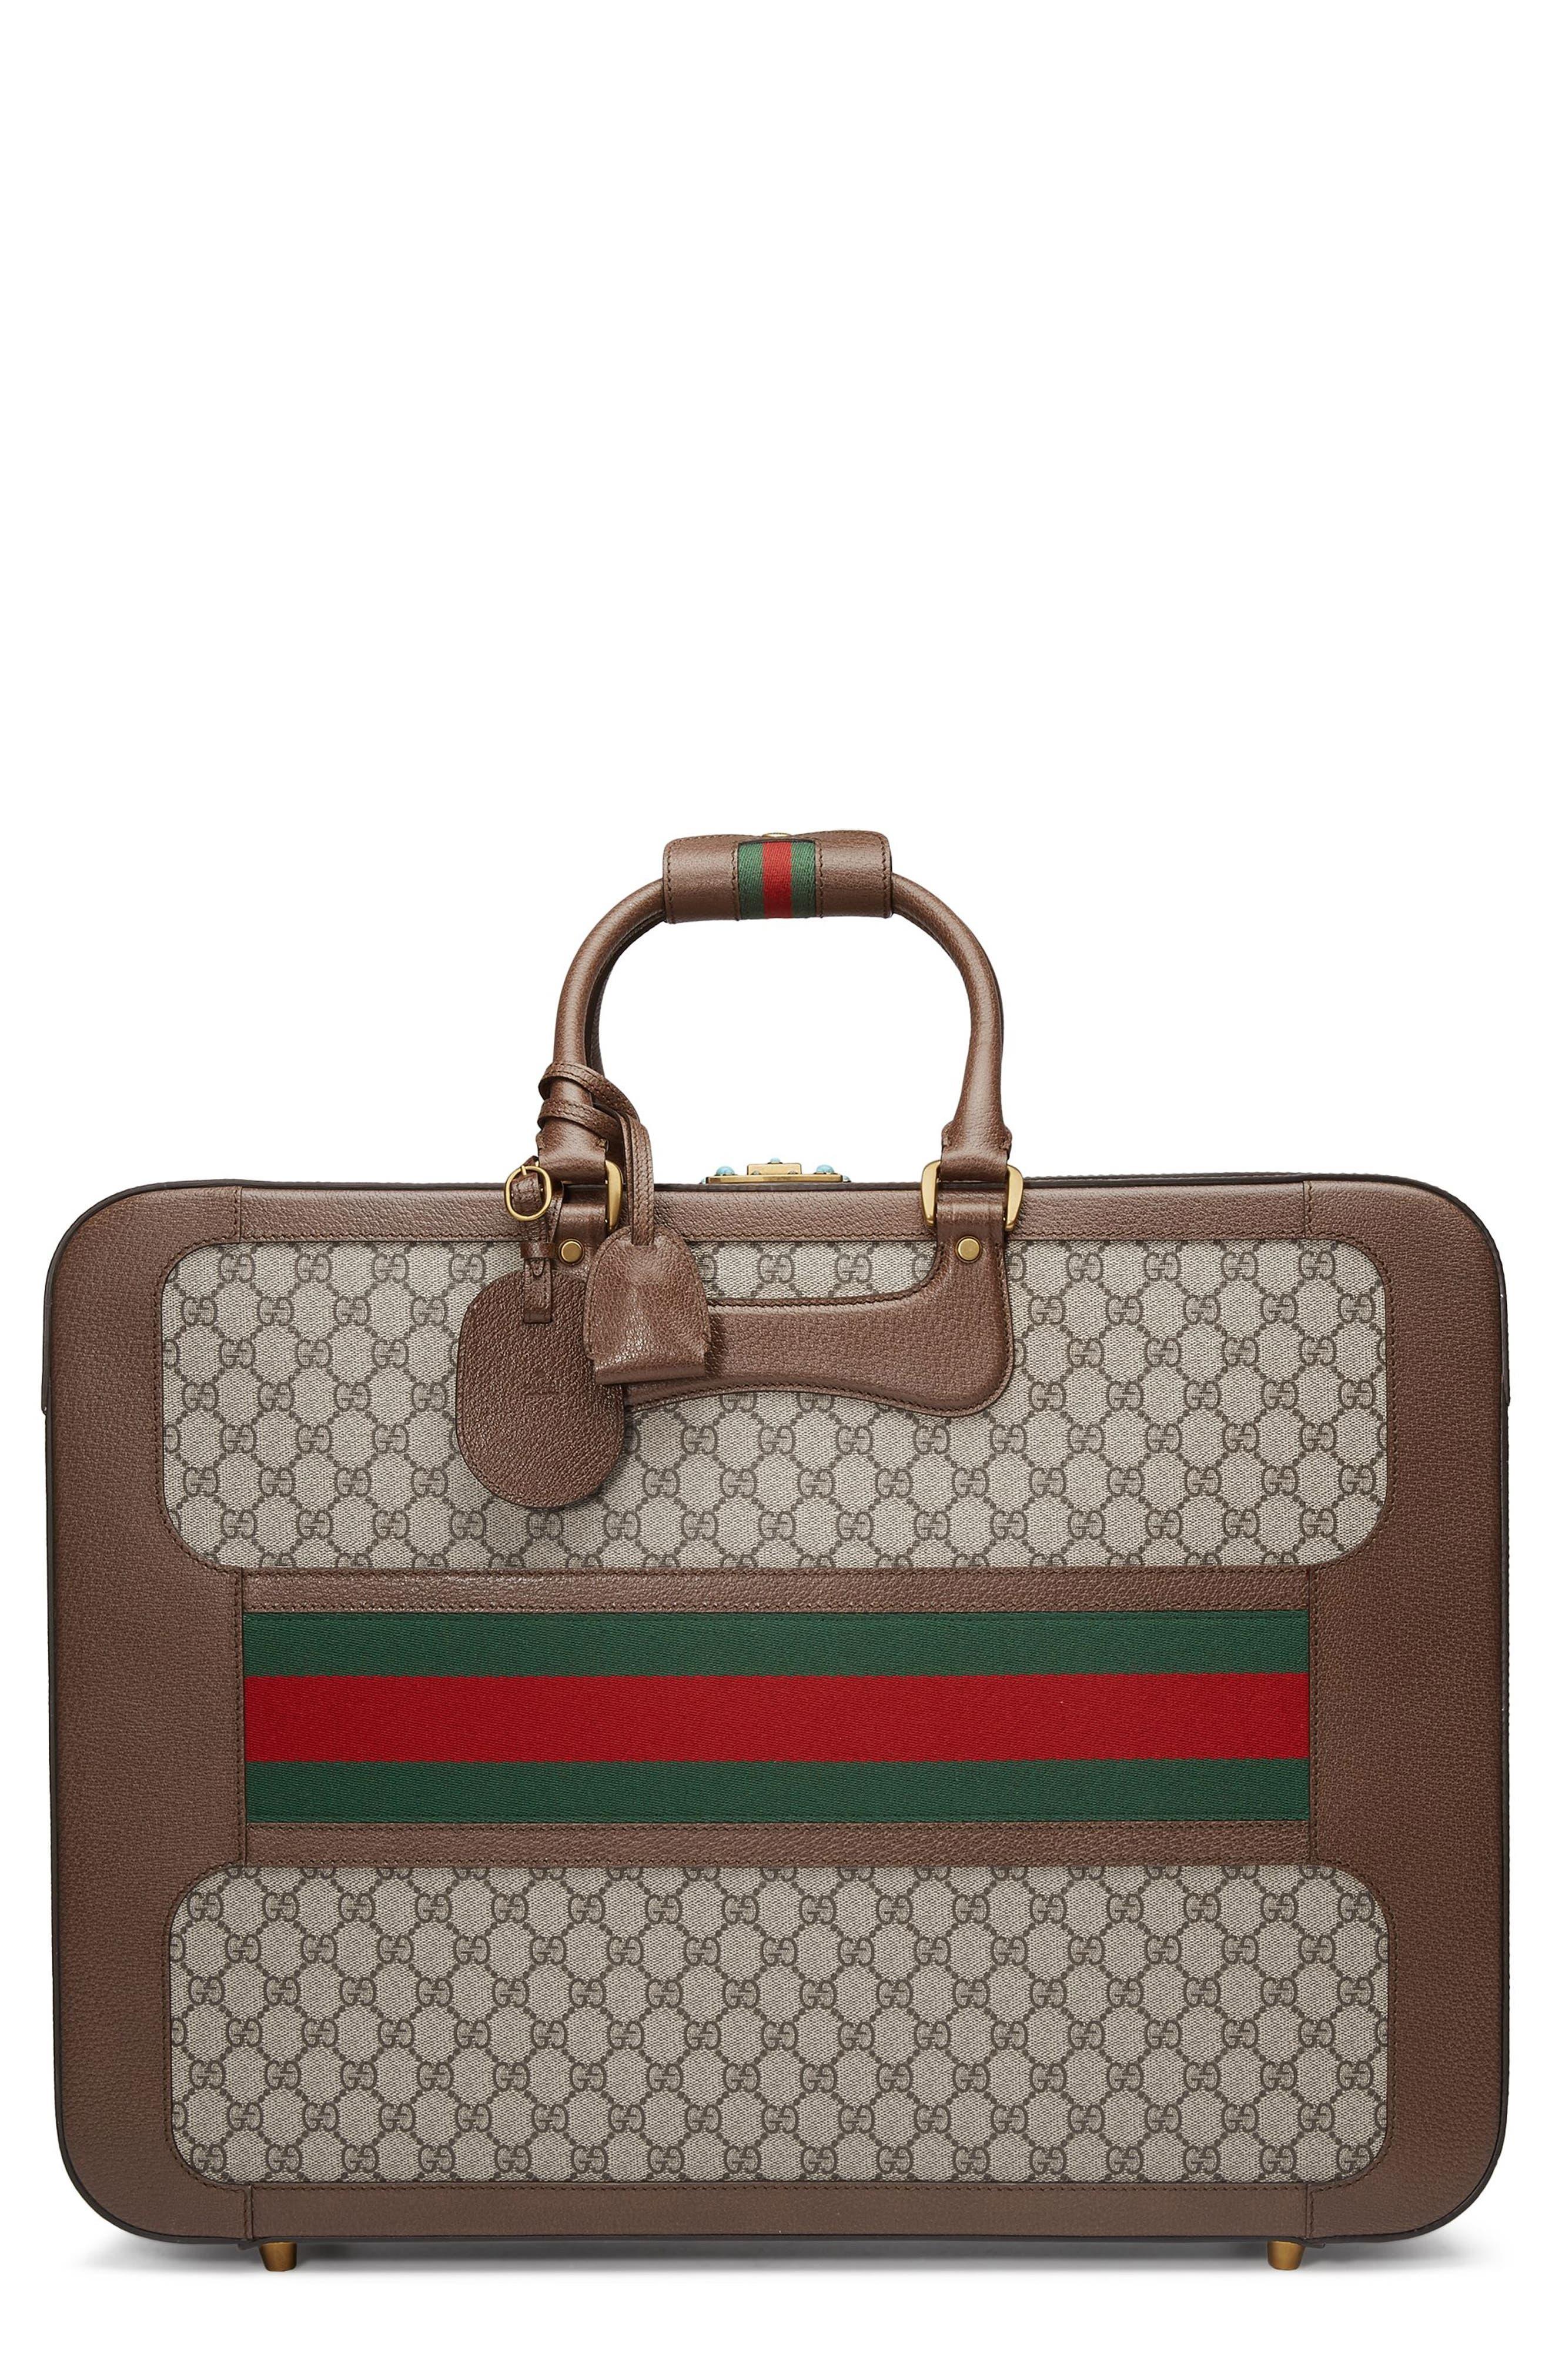 Large Echo GG Supreme Canvas & Leather Suitcase,                         Main,                         color, 283